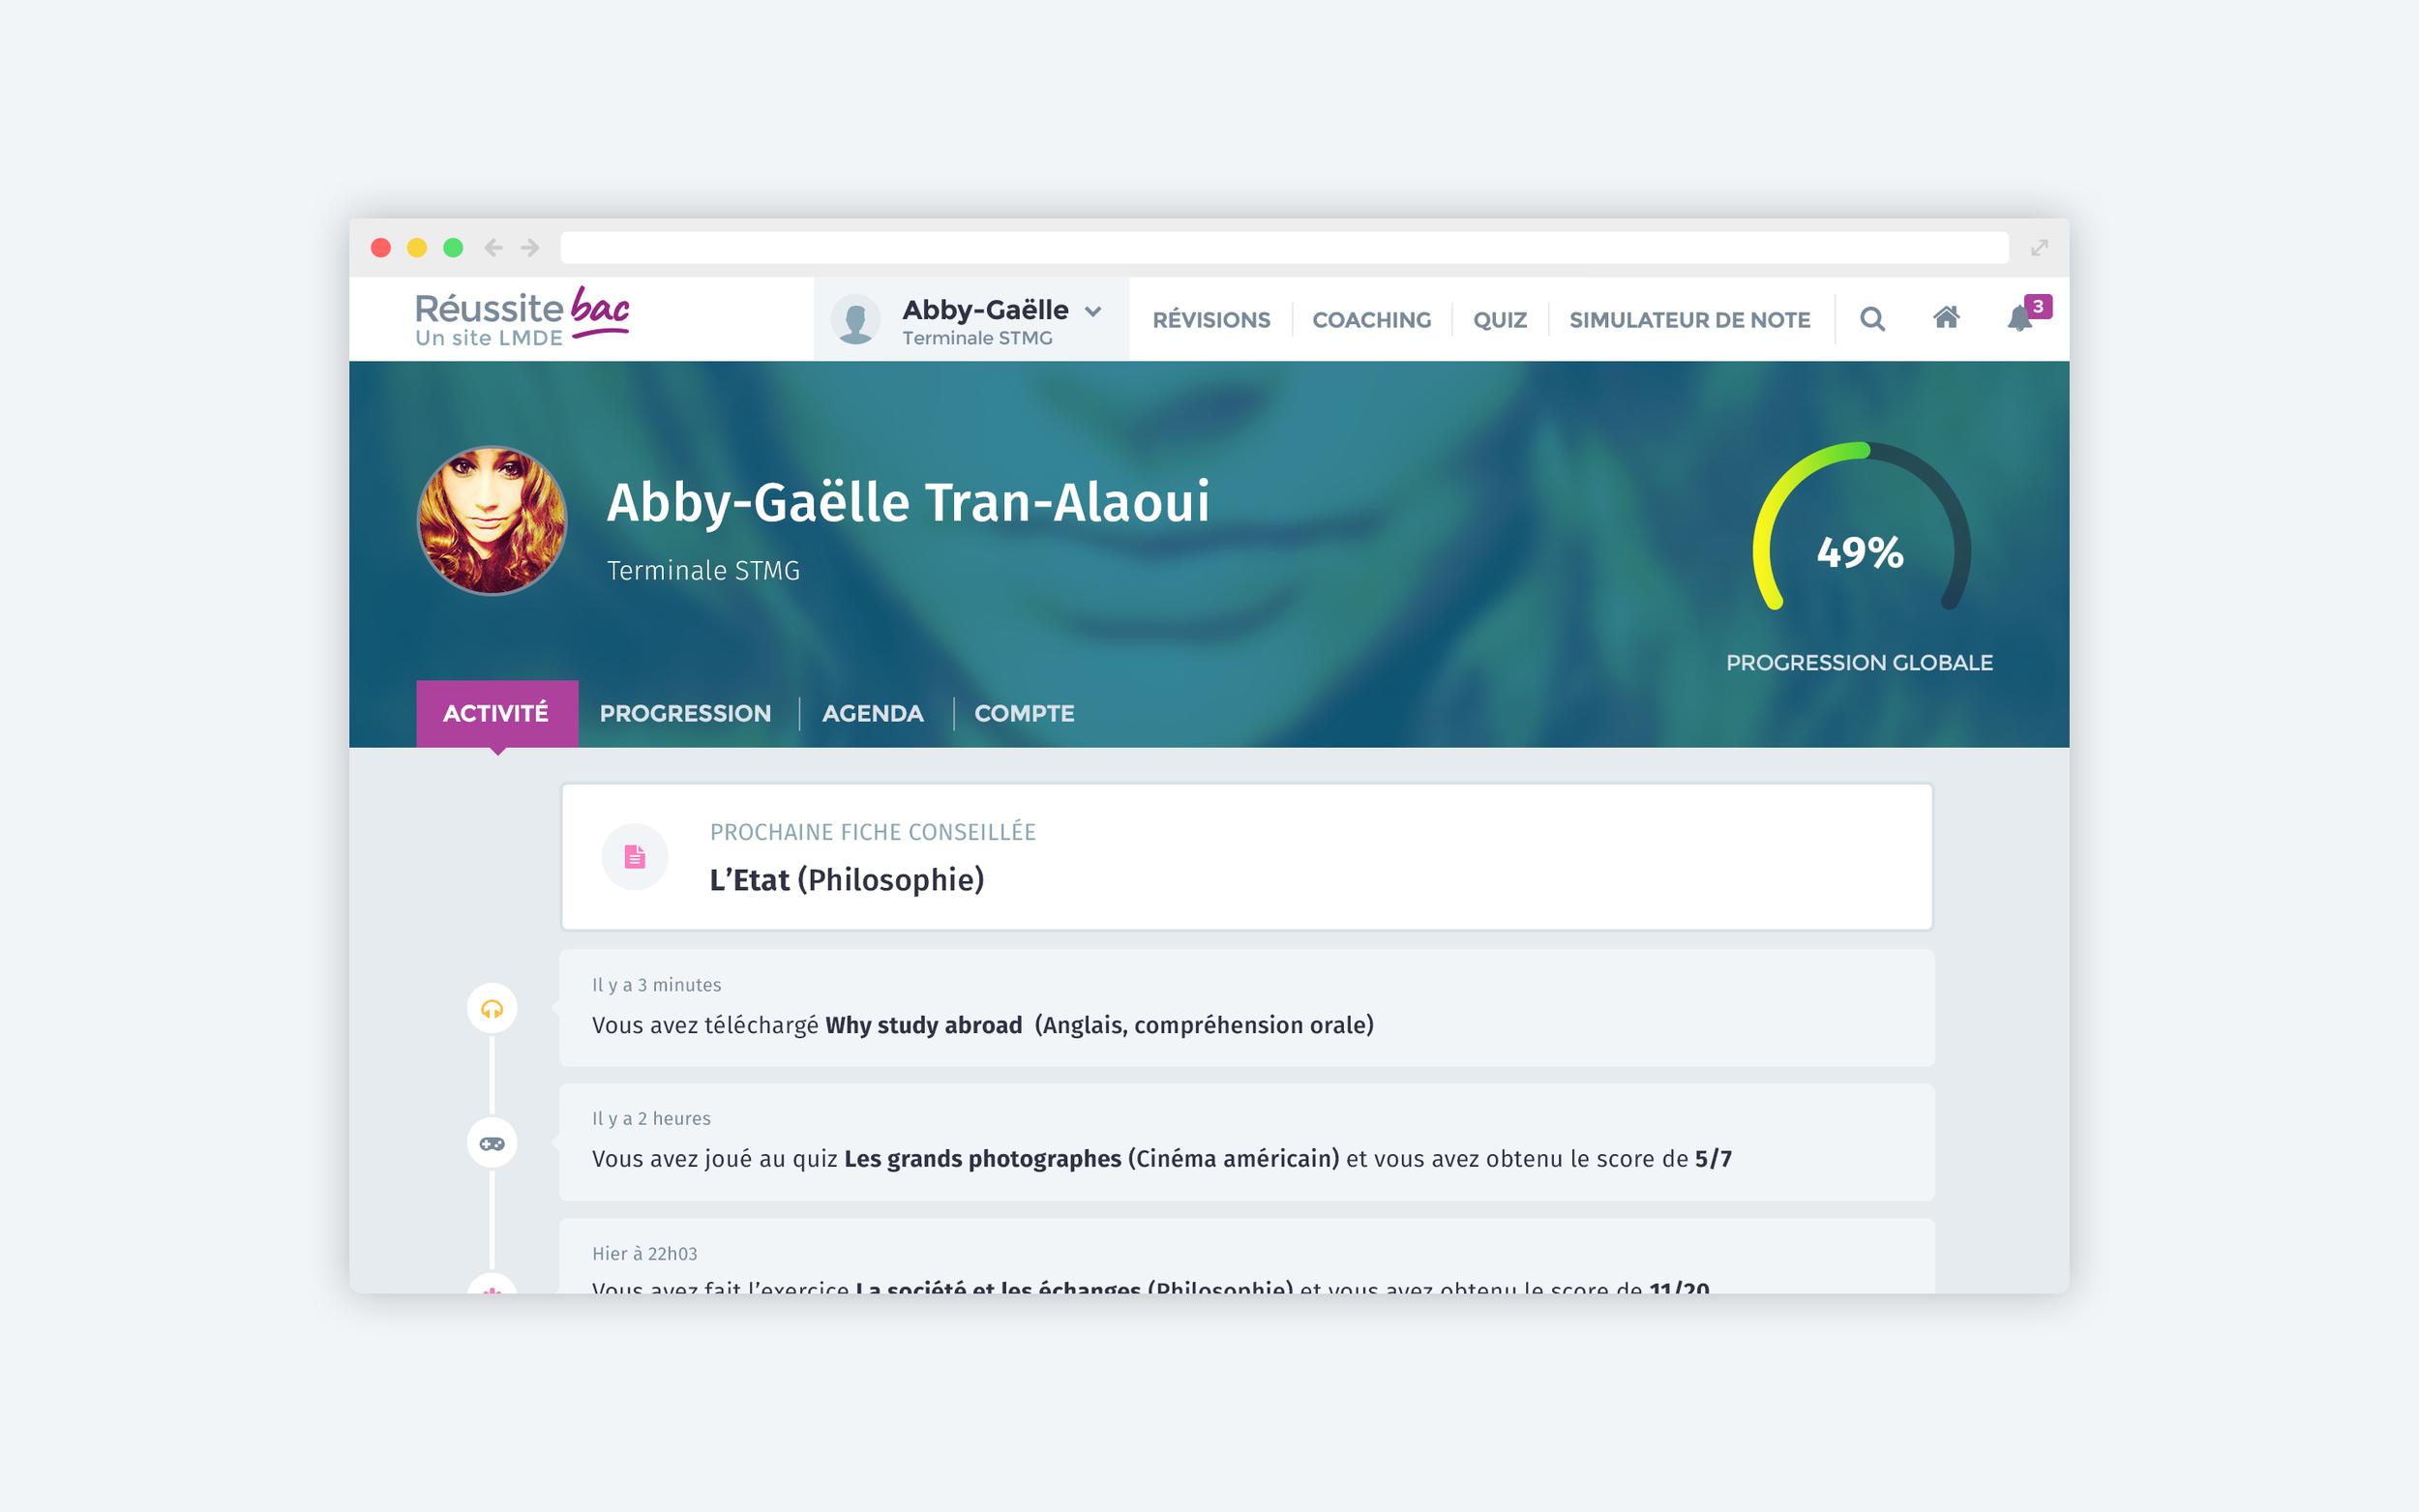 Reussite-Bac_0008_User-activite.png